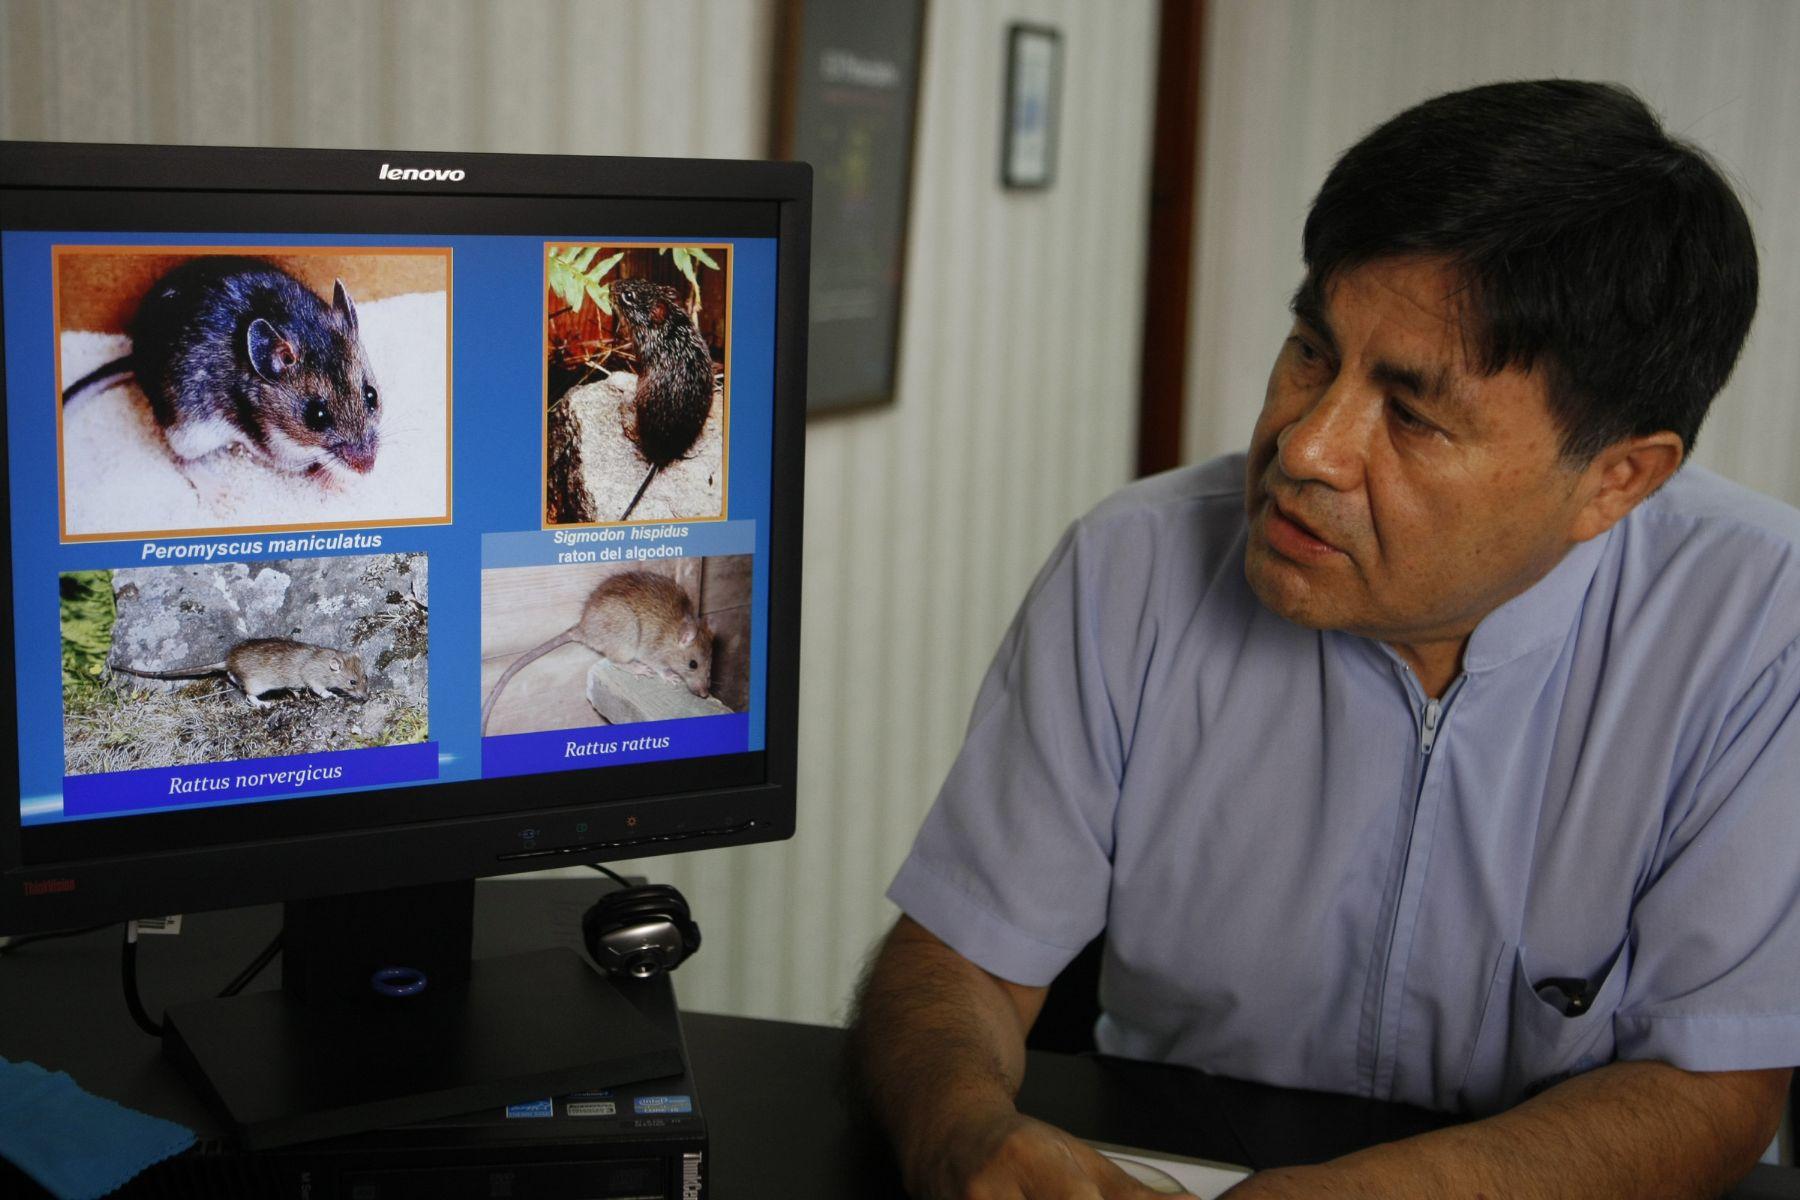 Director del INS César Cabezas informa sobr casos de Hantavirus detectados en Lima. ANDINA/Norman Córdova